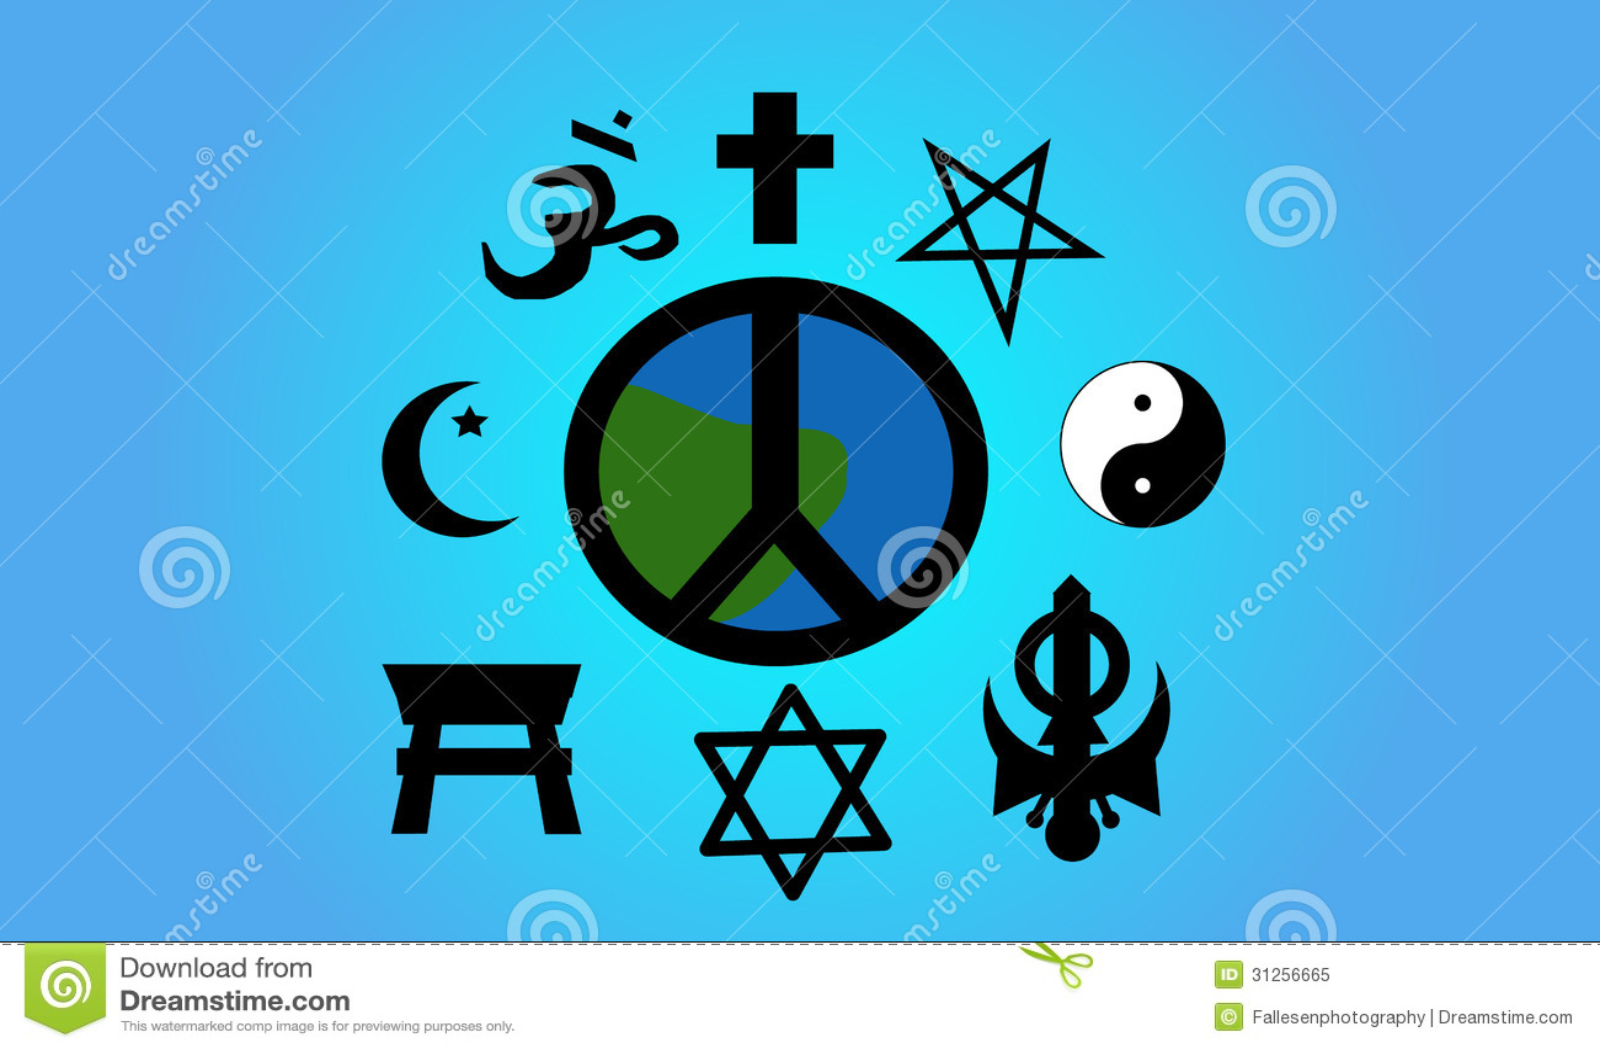 world peace royalty free stock photo image 31256665